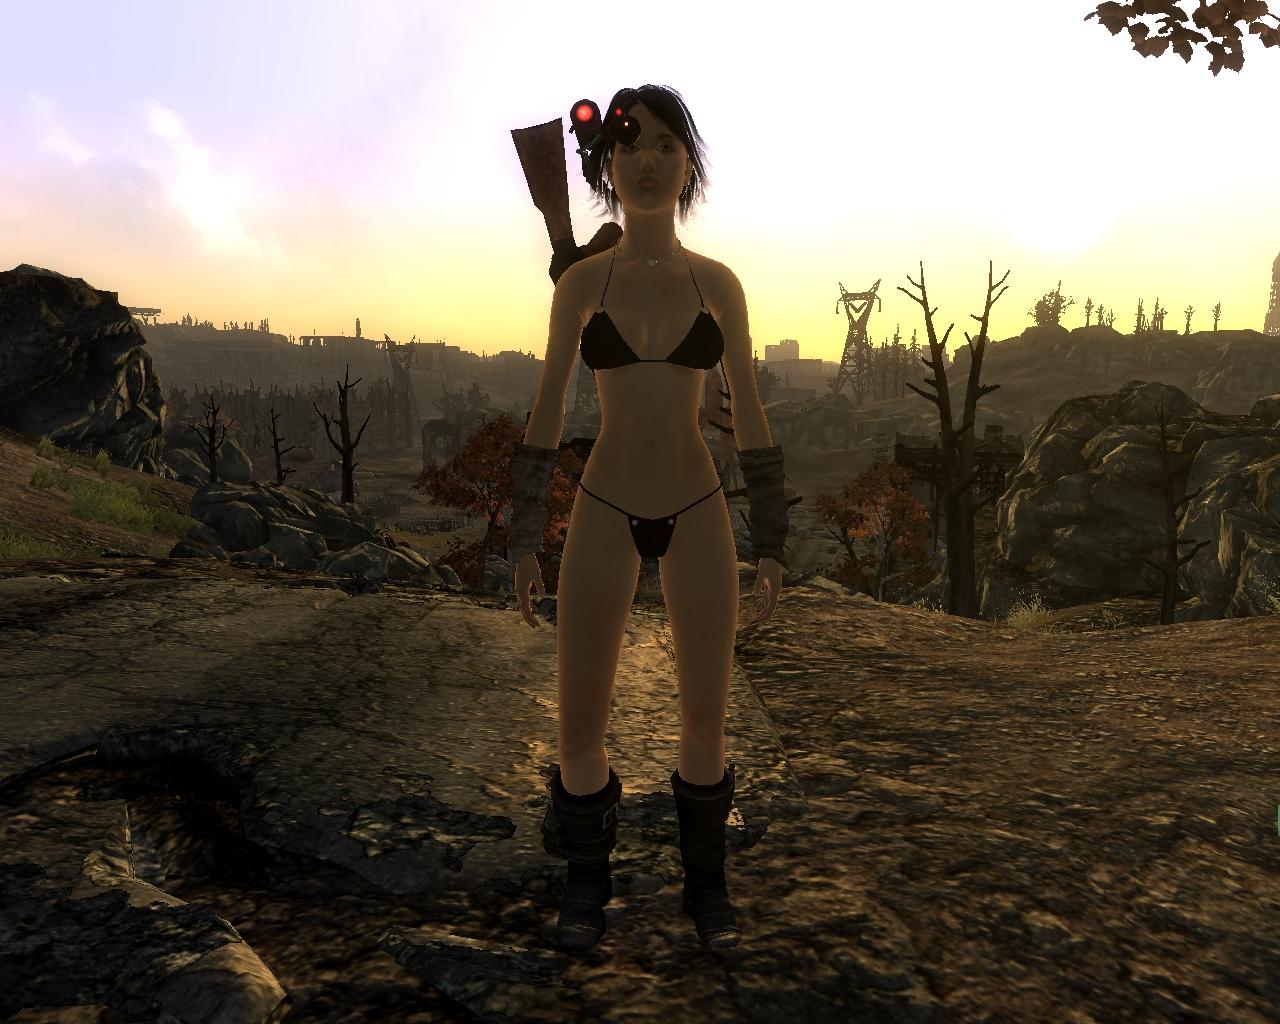 The saboteur nude mod erotica tiny whores